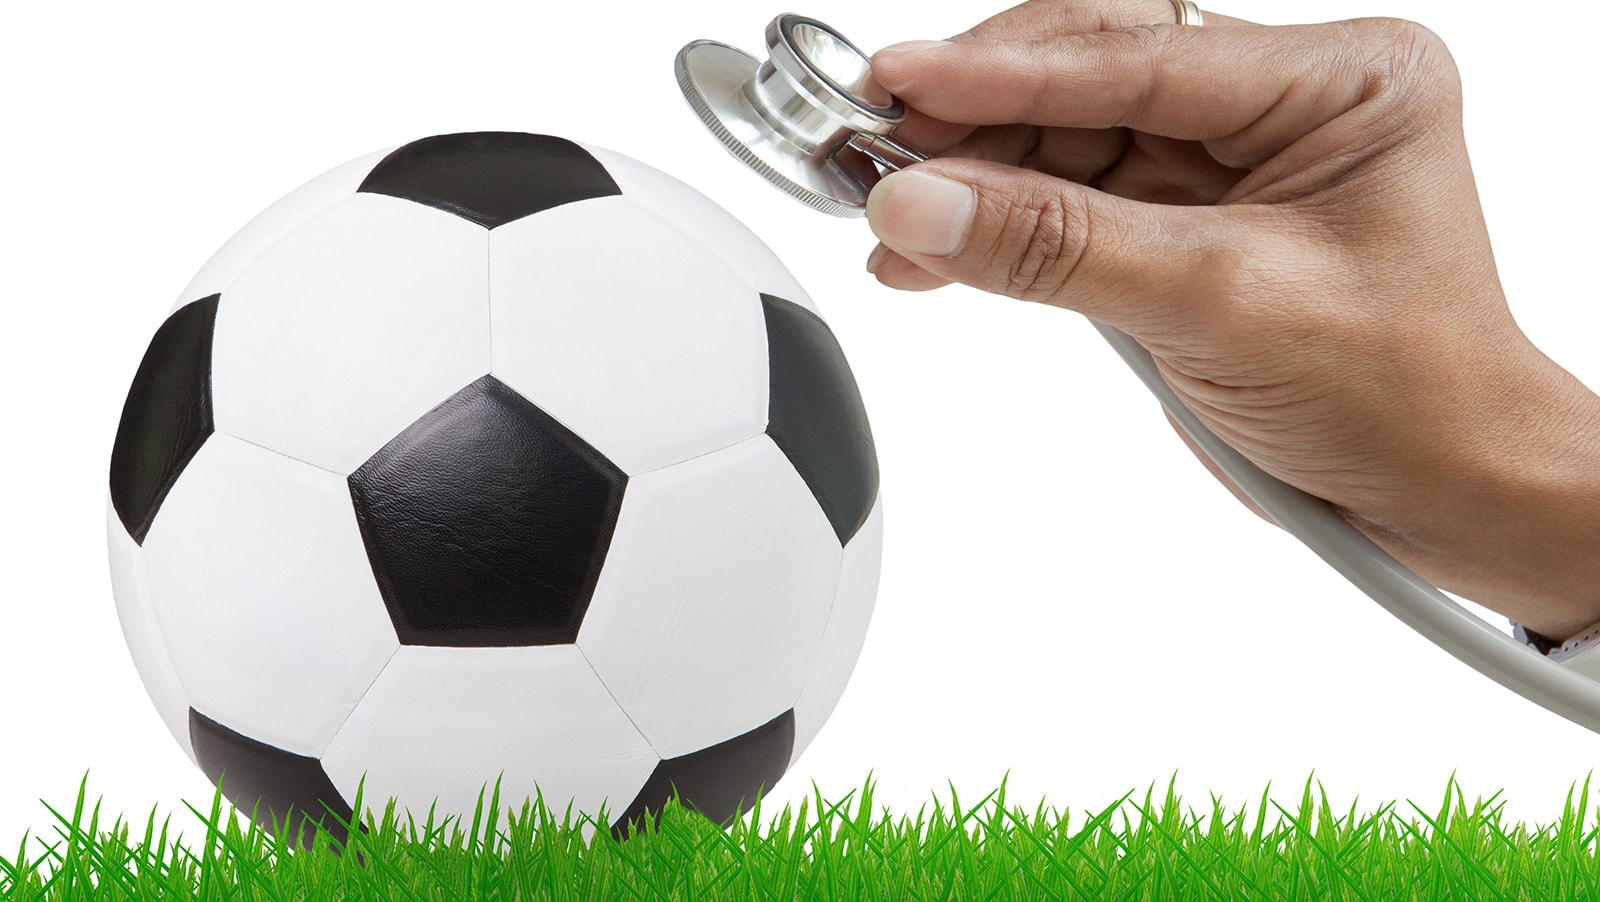 premier-league-season-hangs-in-the-balance-as-money-and-health-battle-for-power-min